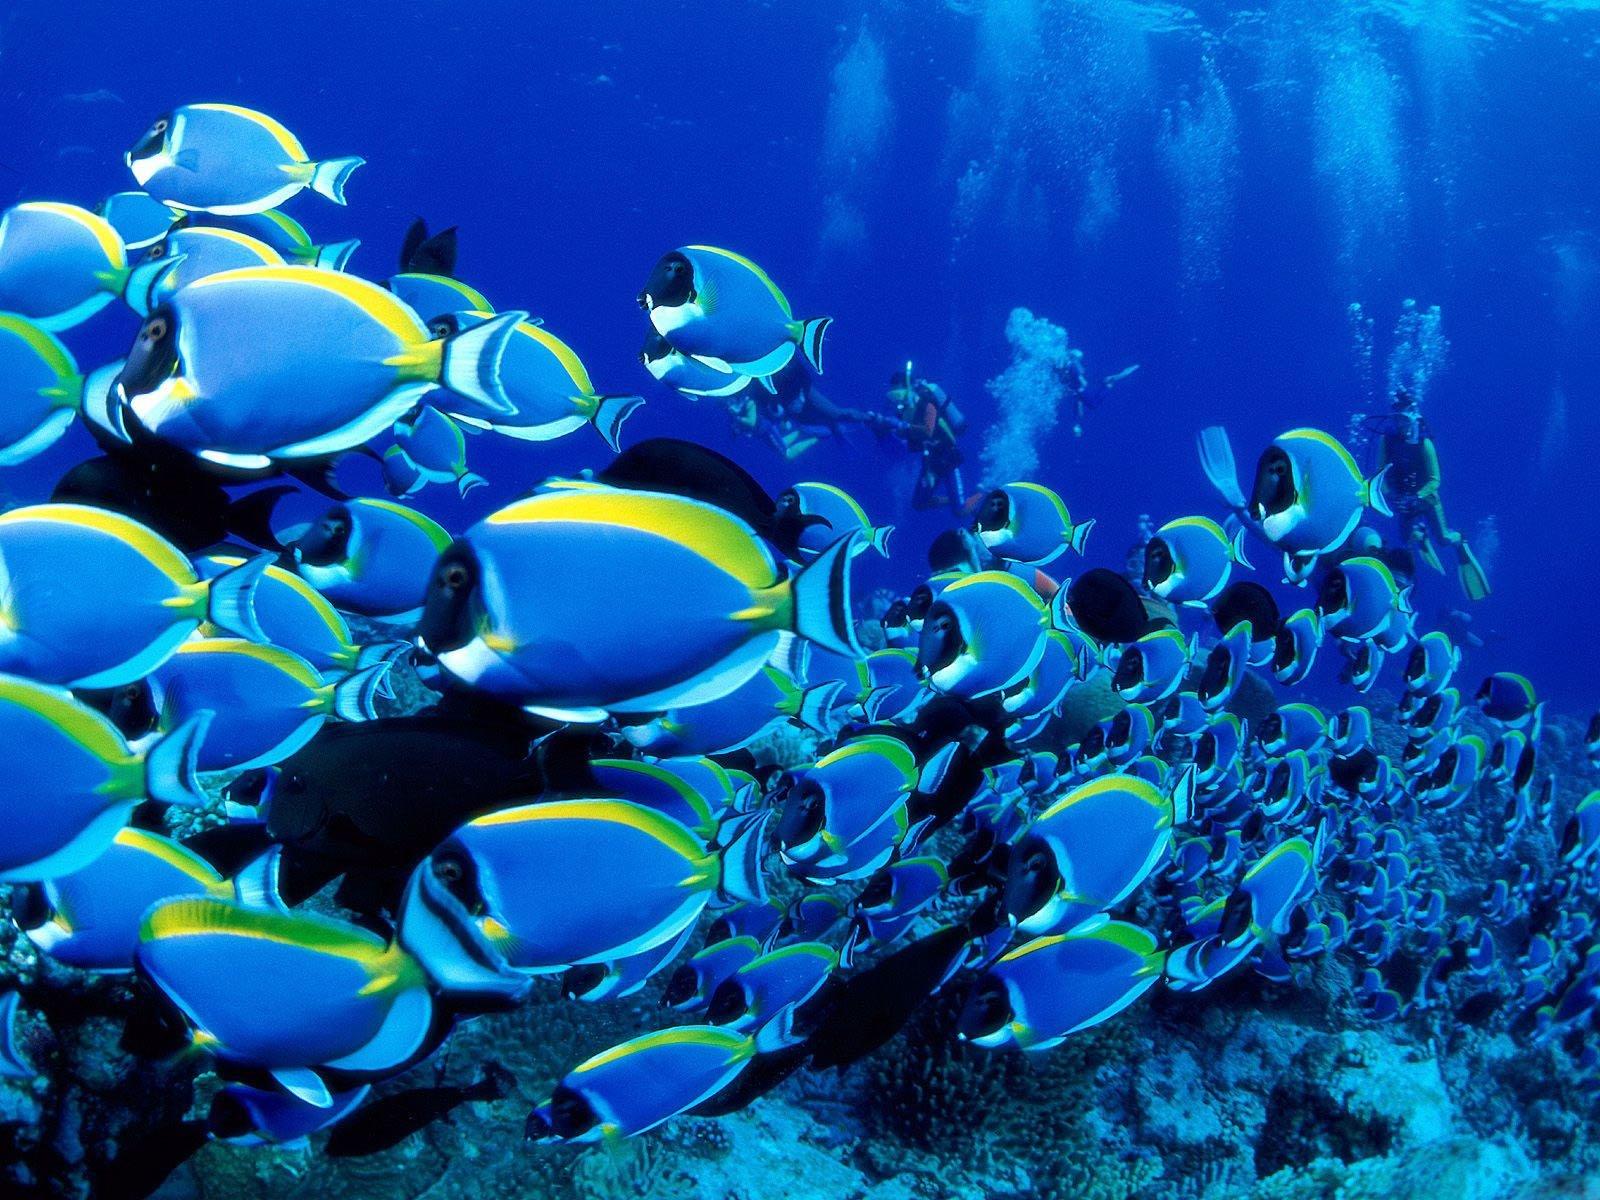 Fishes In Deep wallpaper   Underwater wallpapers   wallpapers 1600x1200